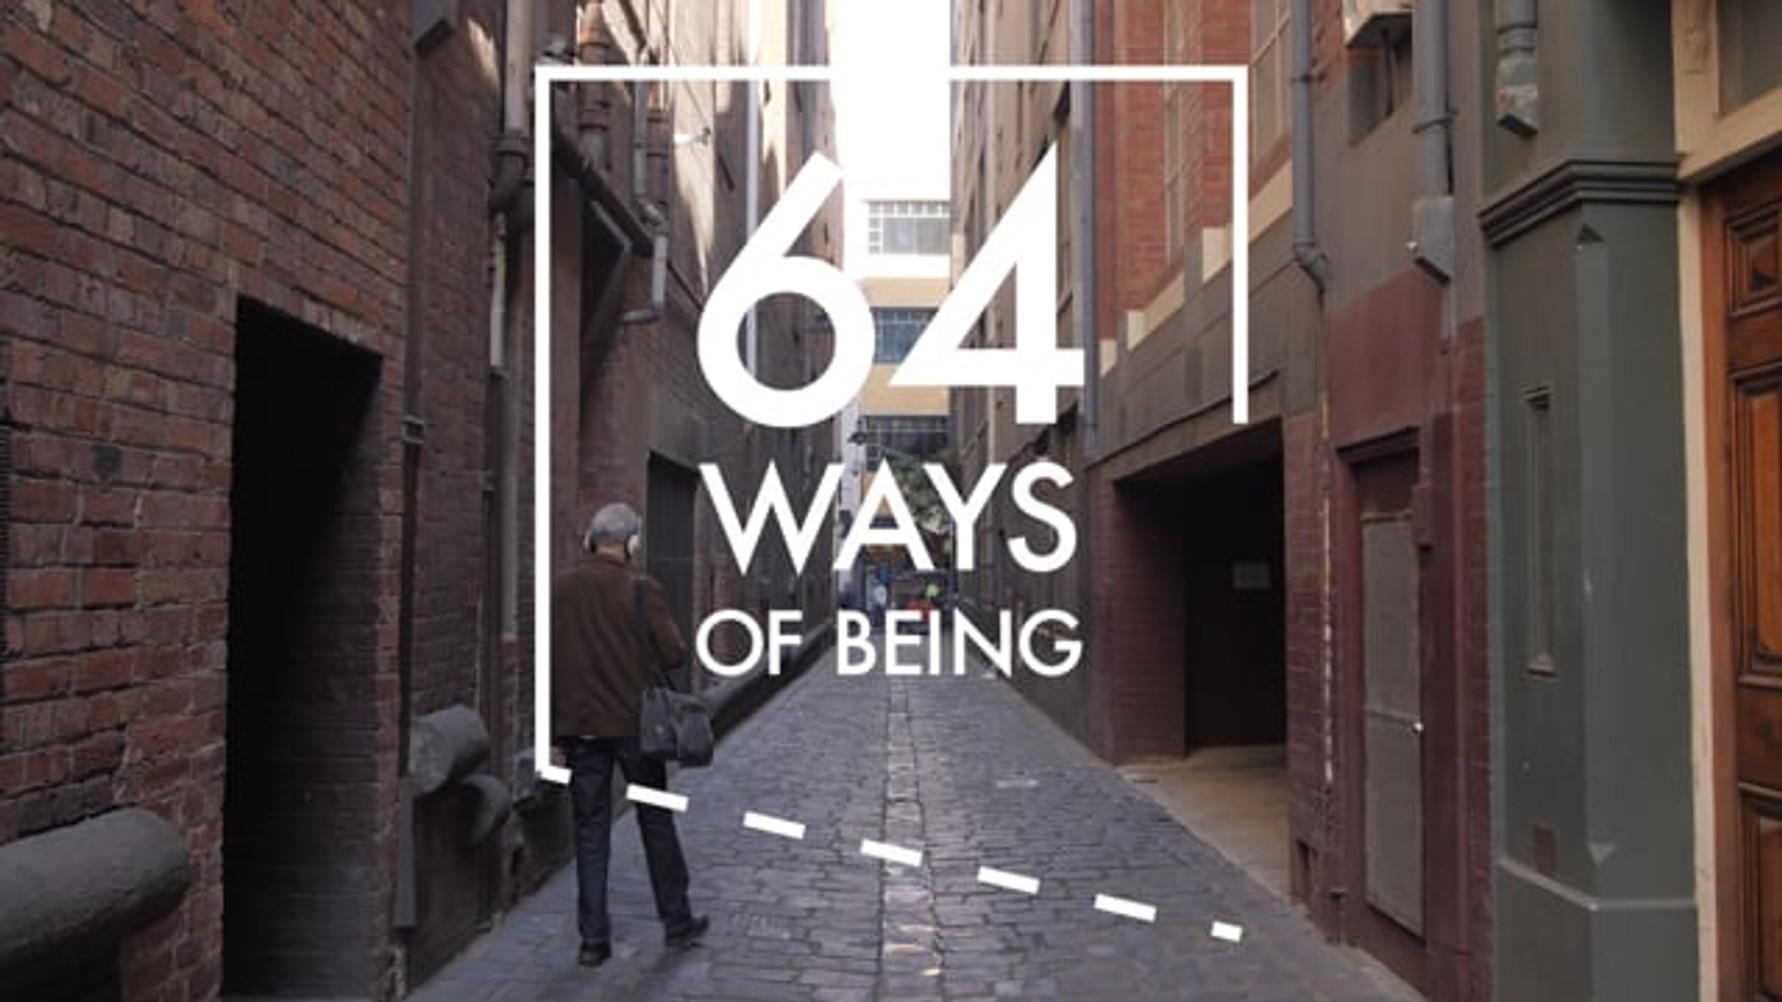 64 Ways of Being (2020, 64 Ways of Being)